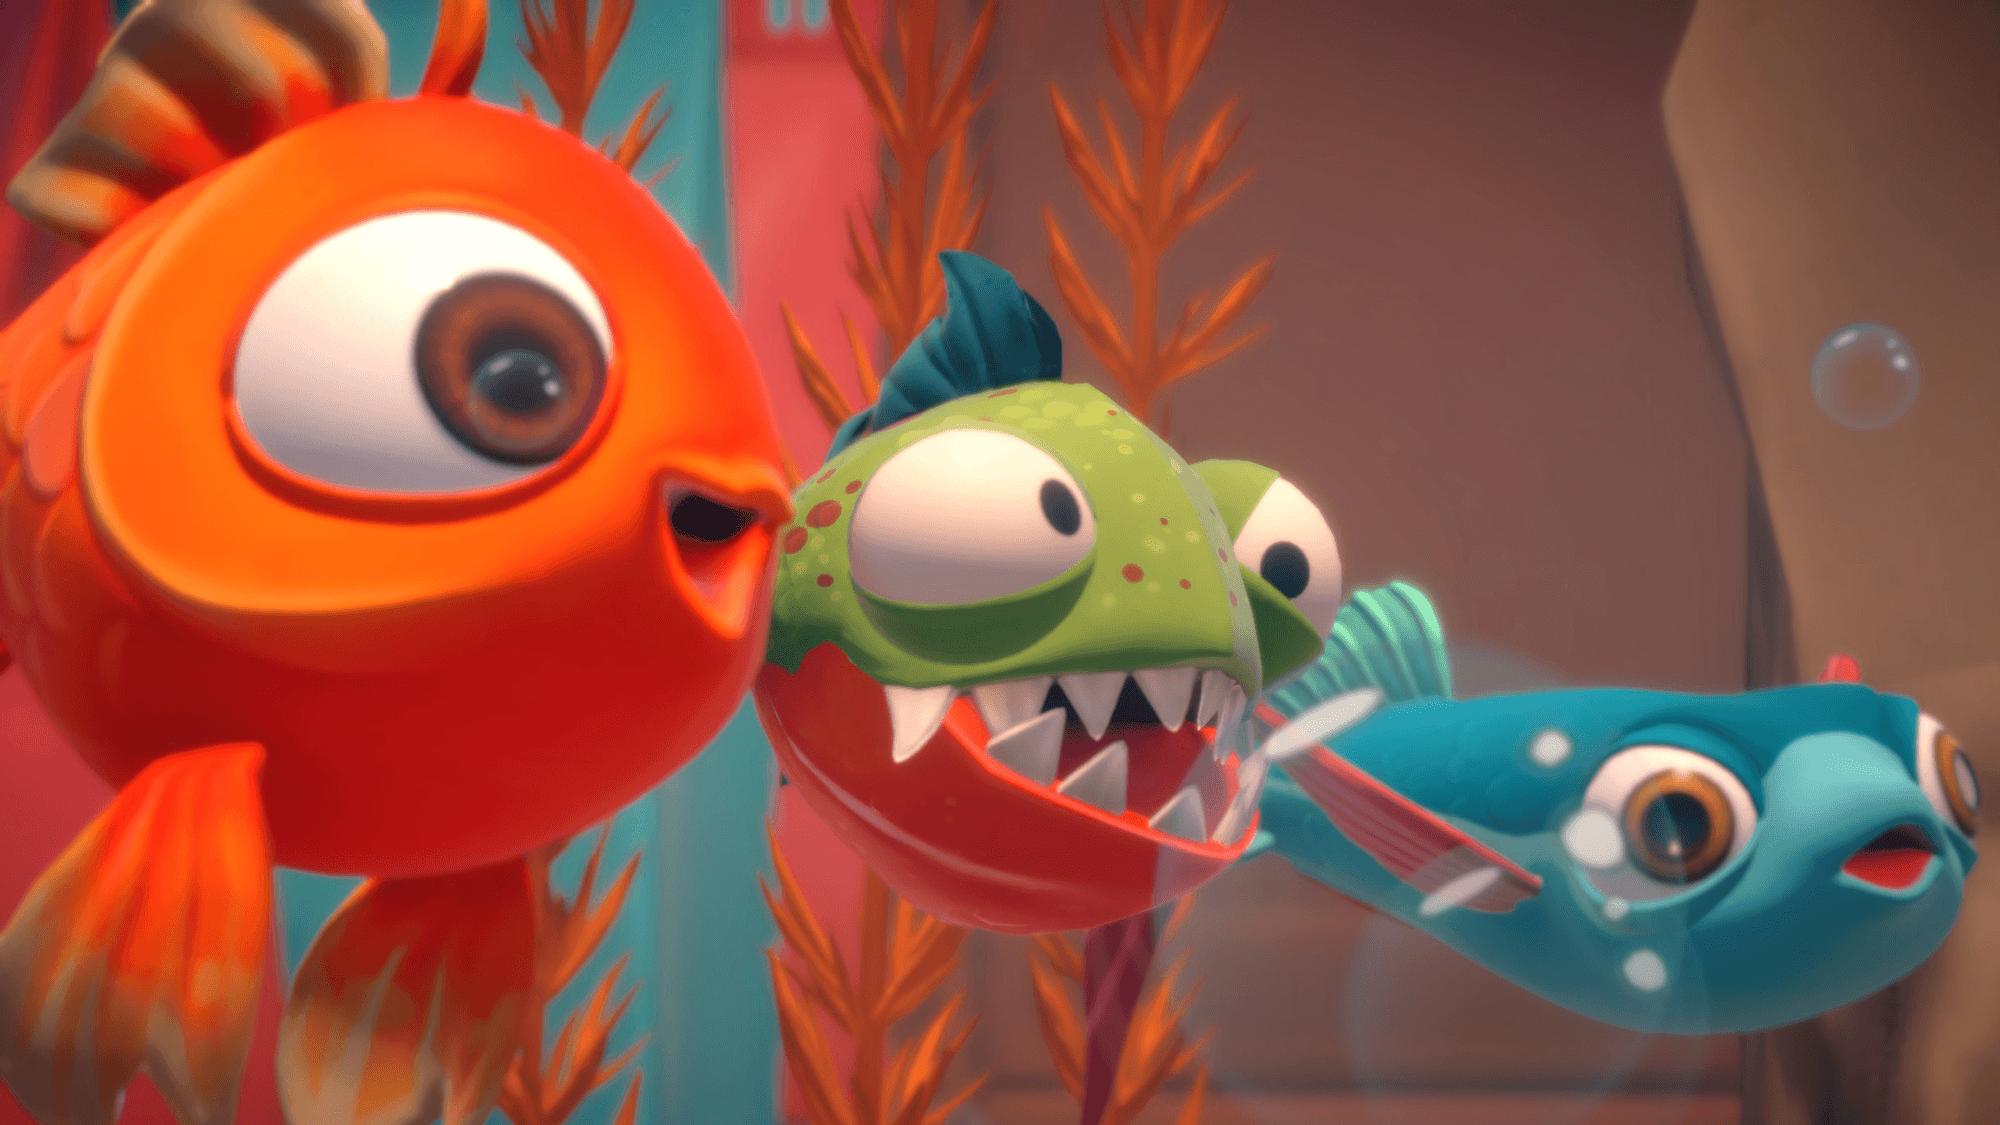 The I Am Fish thumbnail image